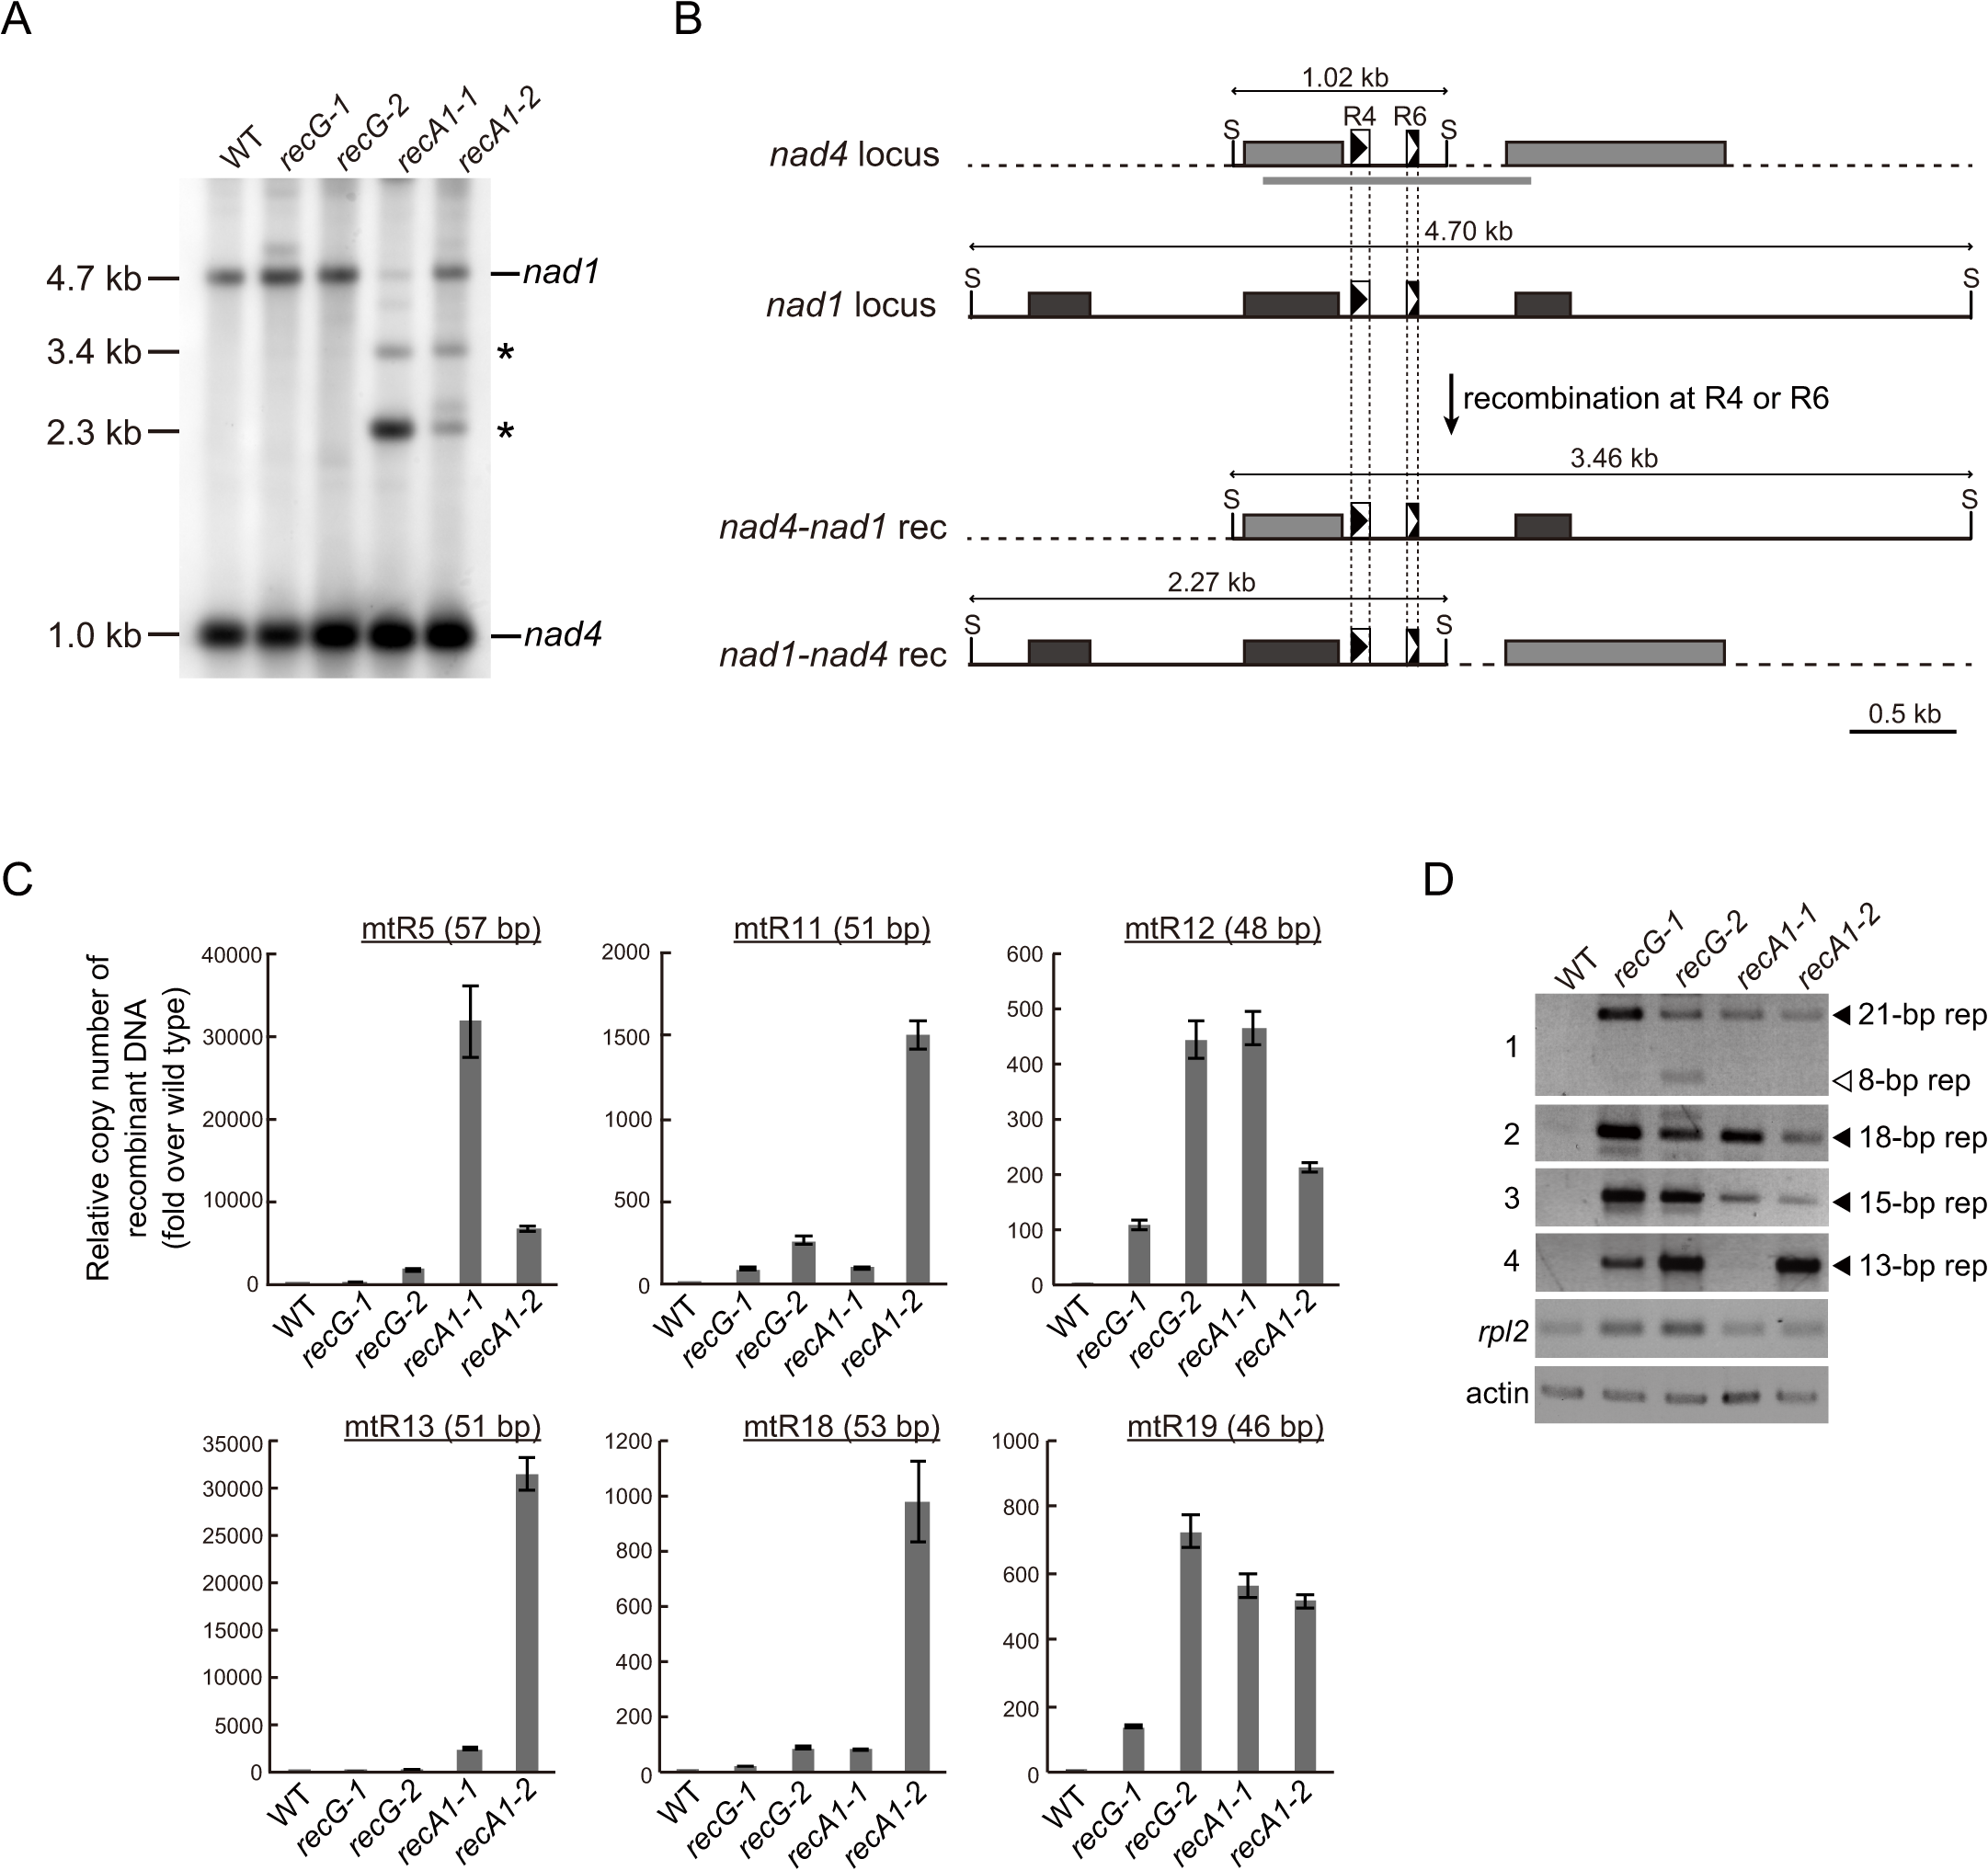 Genomic instability in <i>RECG</i> and <i>RECA1</i> KO mitochondria.